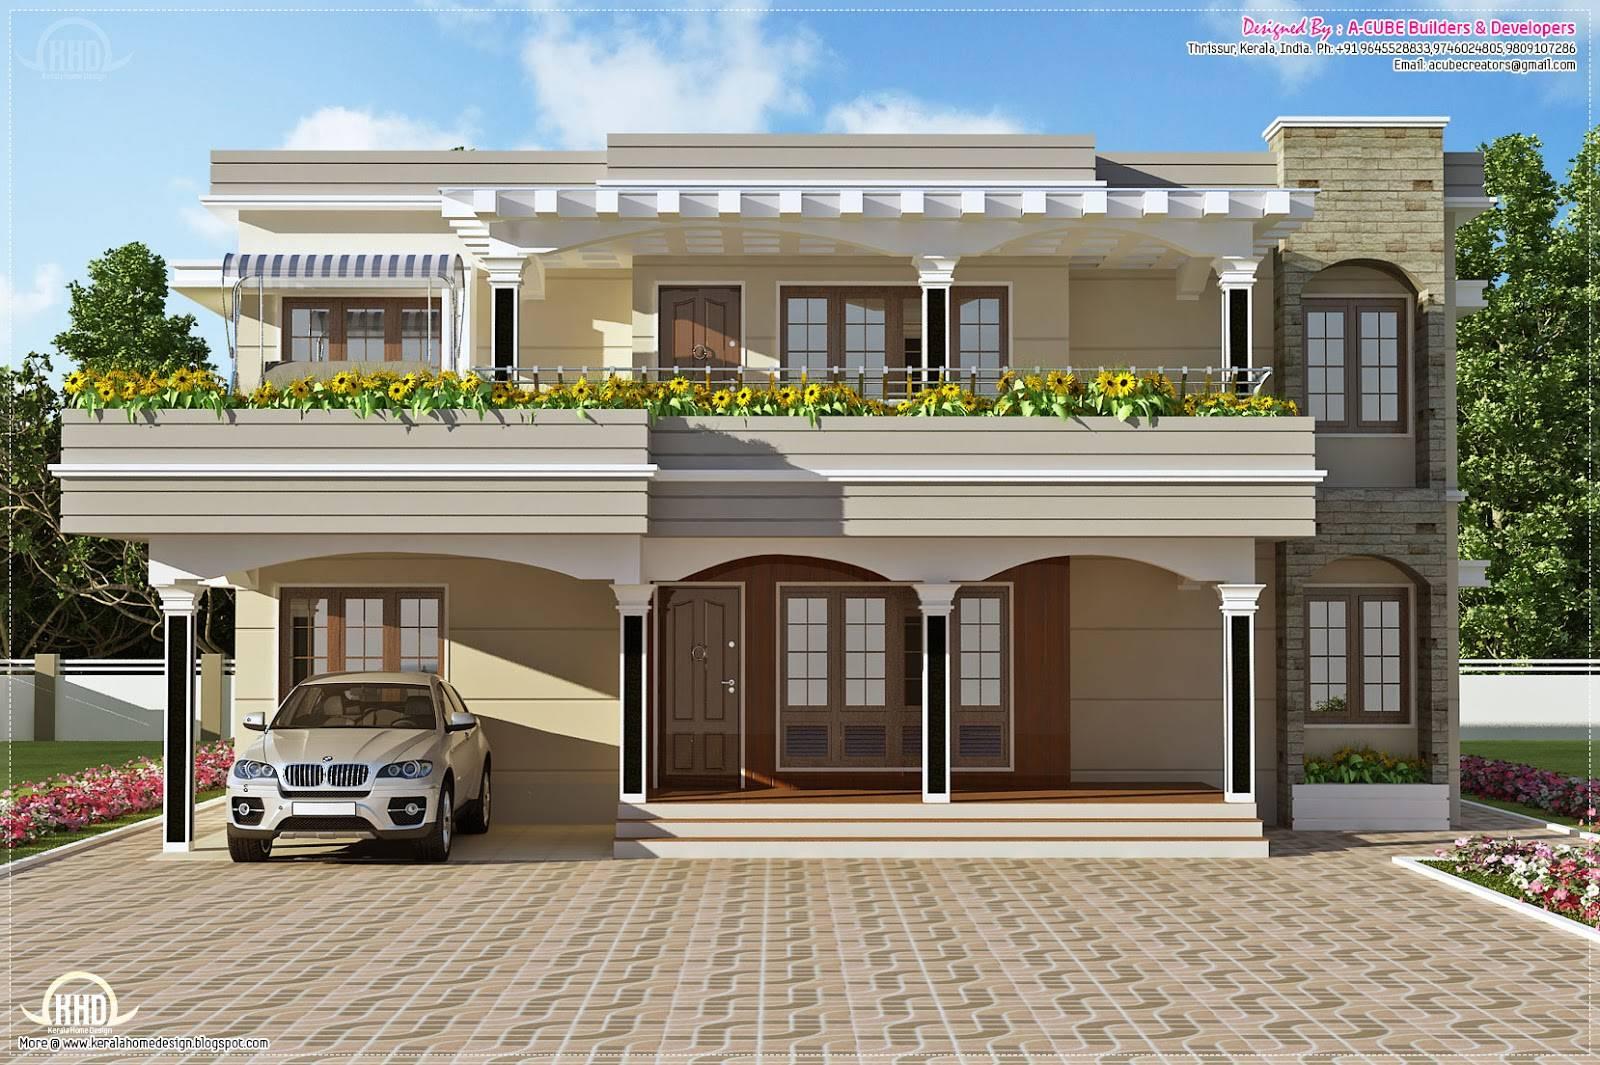 Flat Roof Houses Modern Rambler House Designs Lrg House Plans 42125